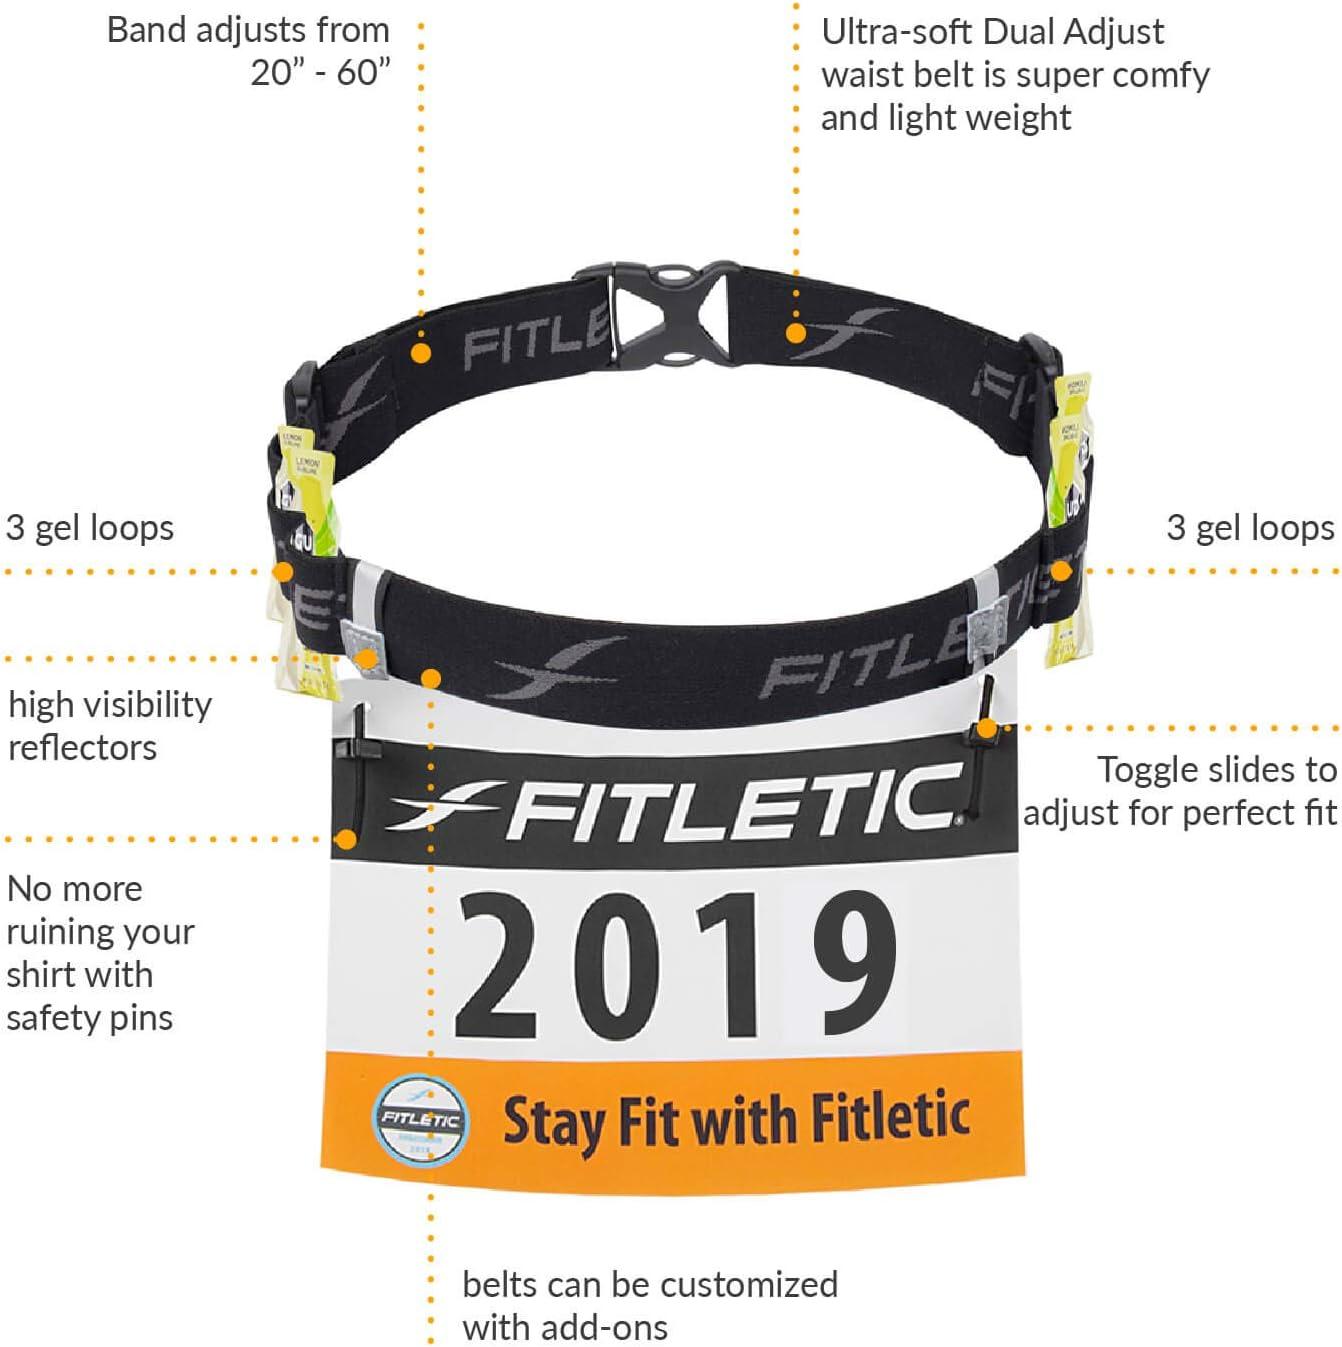 Fitletic Race Bib Belt with Gel Loops 5k 10k Race Number Belt for Triathlon Marathon Ironman RN06 Race 2 Trail Running